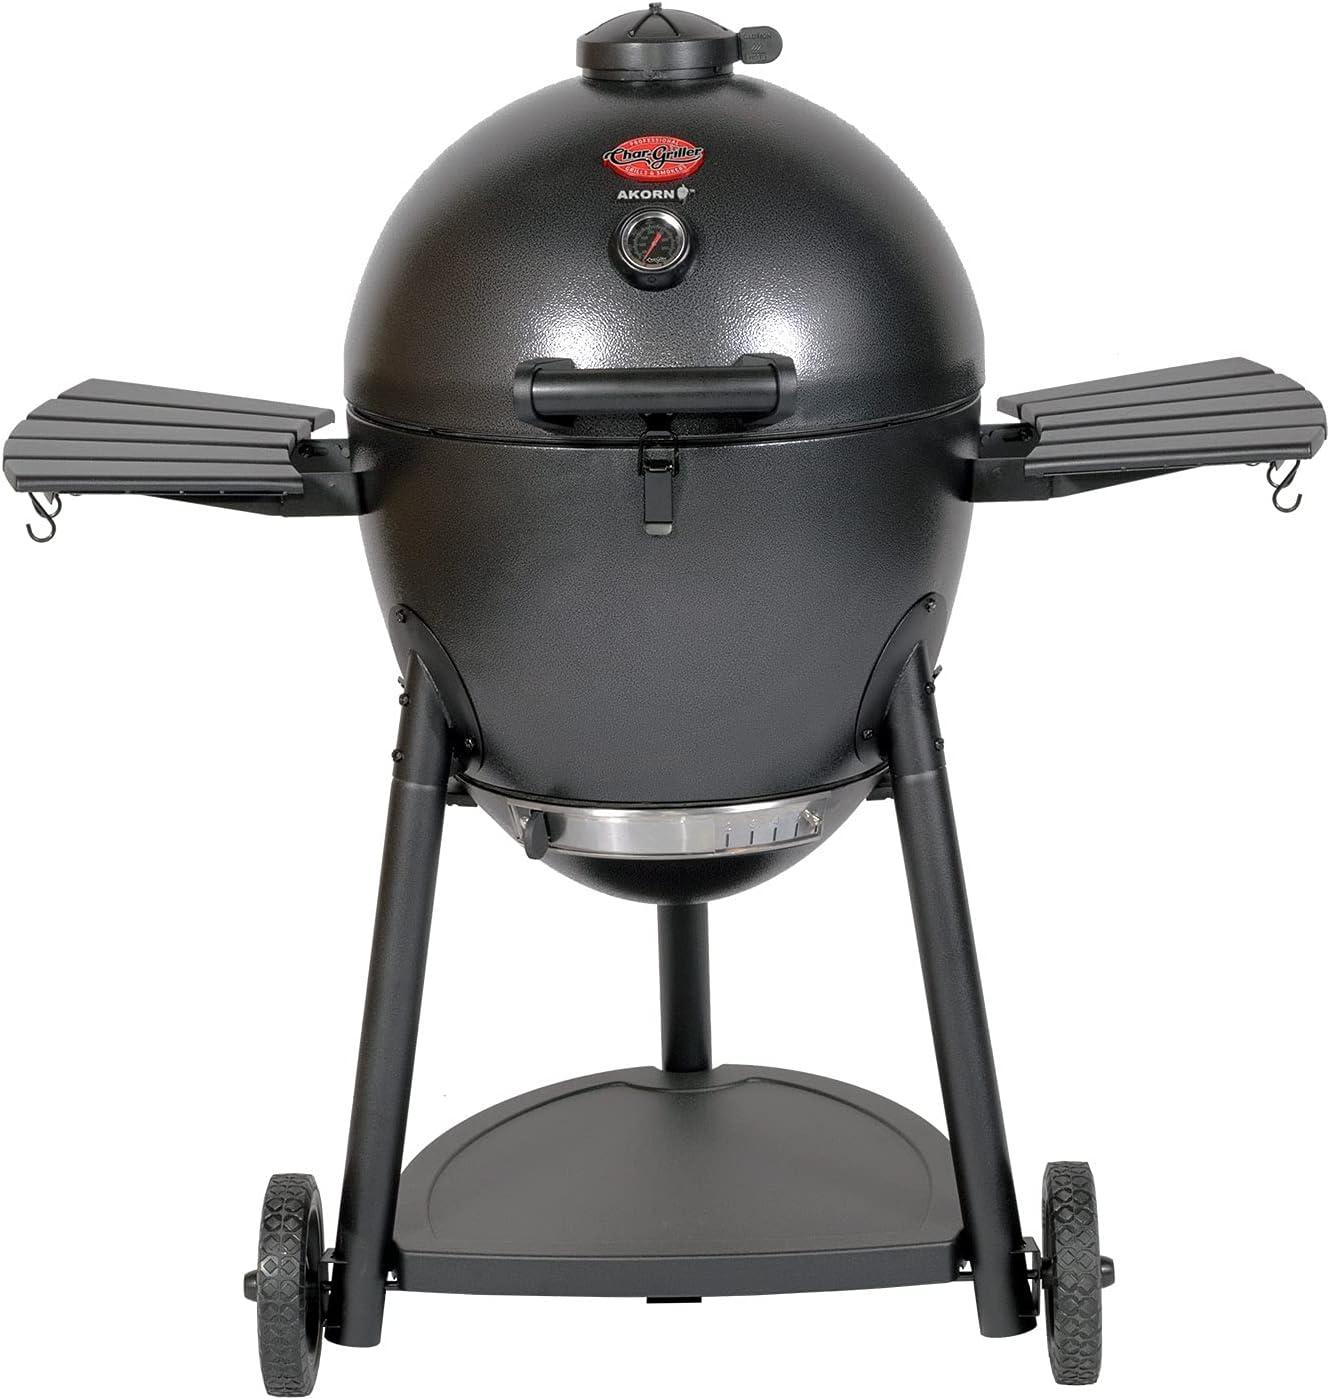 Char-Griller-E16620-Akorn-Kamado-Charcoal-Grill,-Graphite